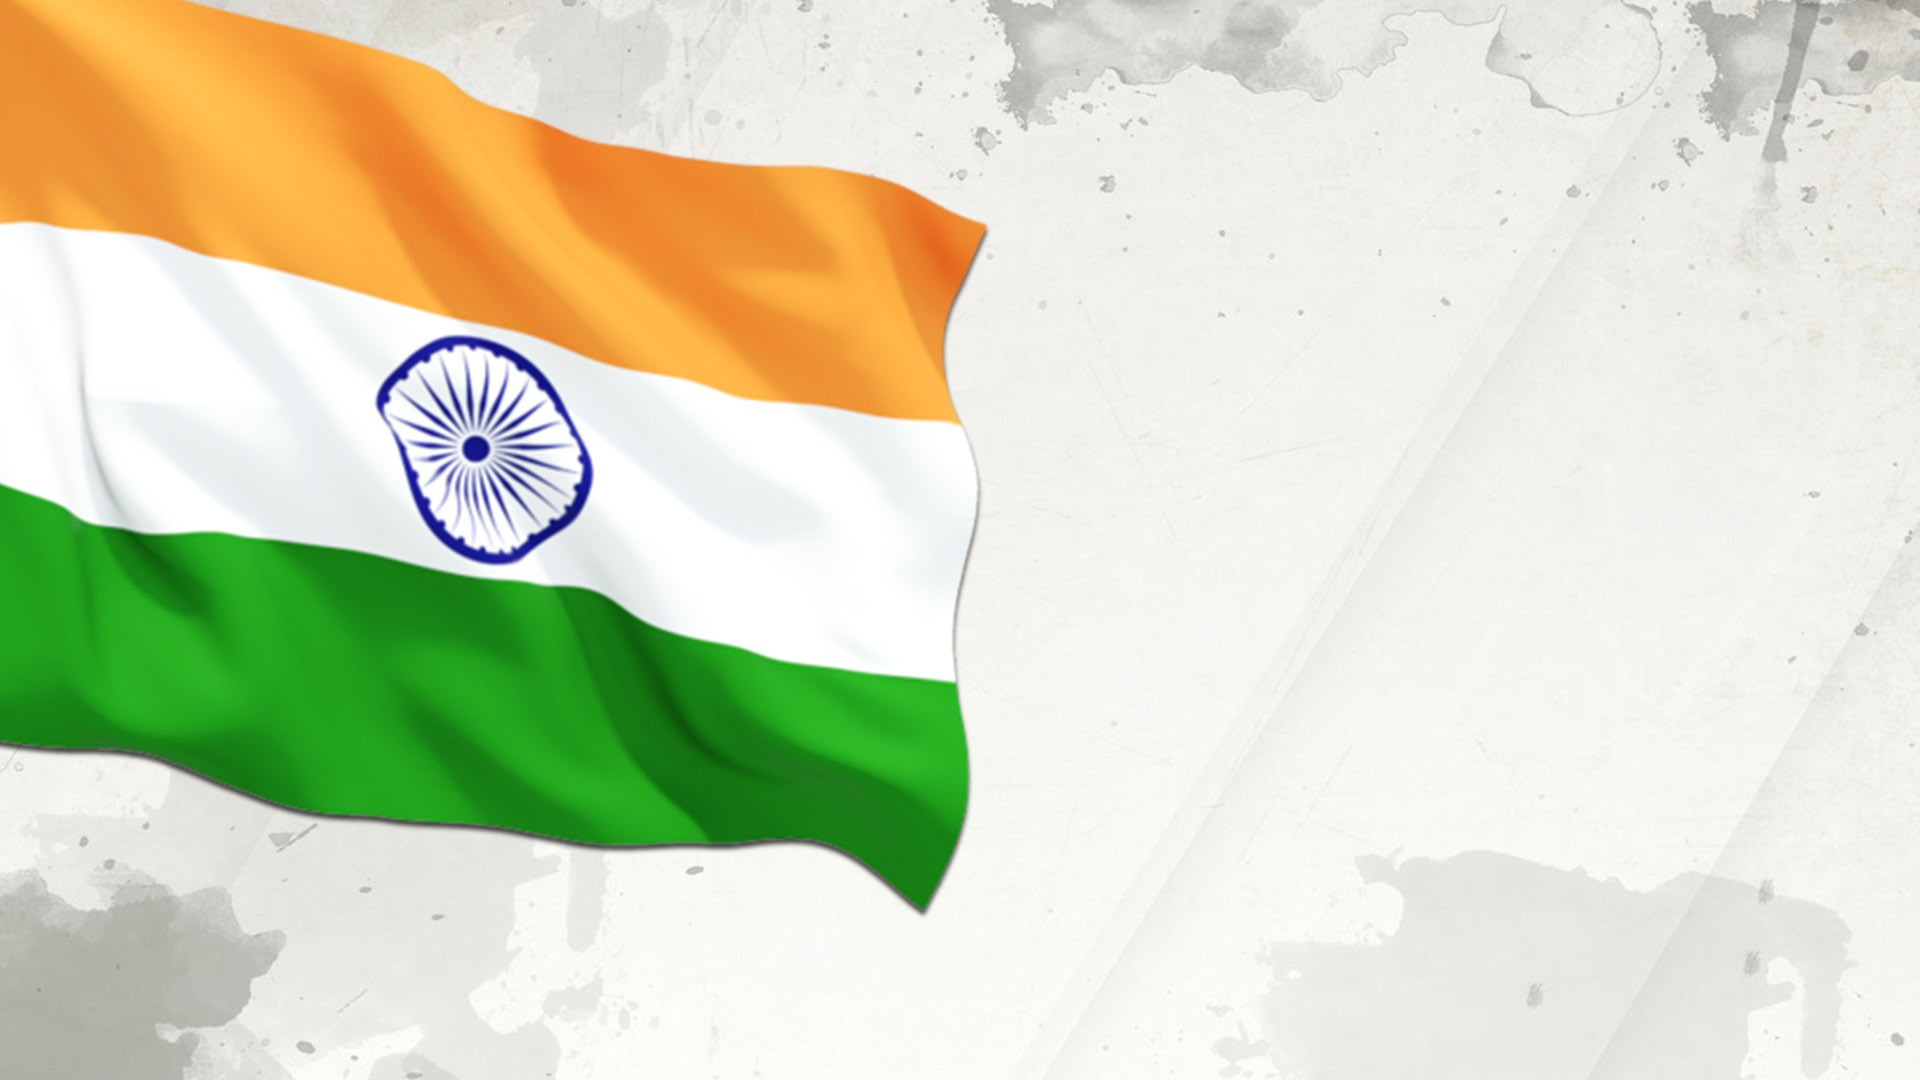 Indian Flag Background Wallpaper 34879 Baltana